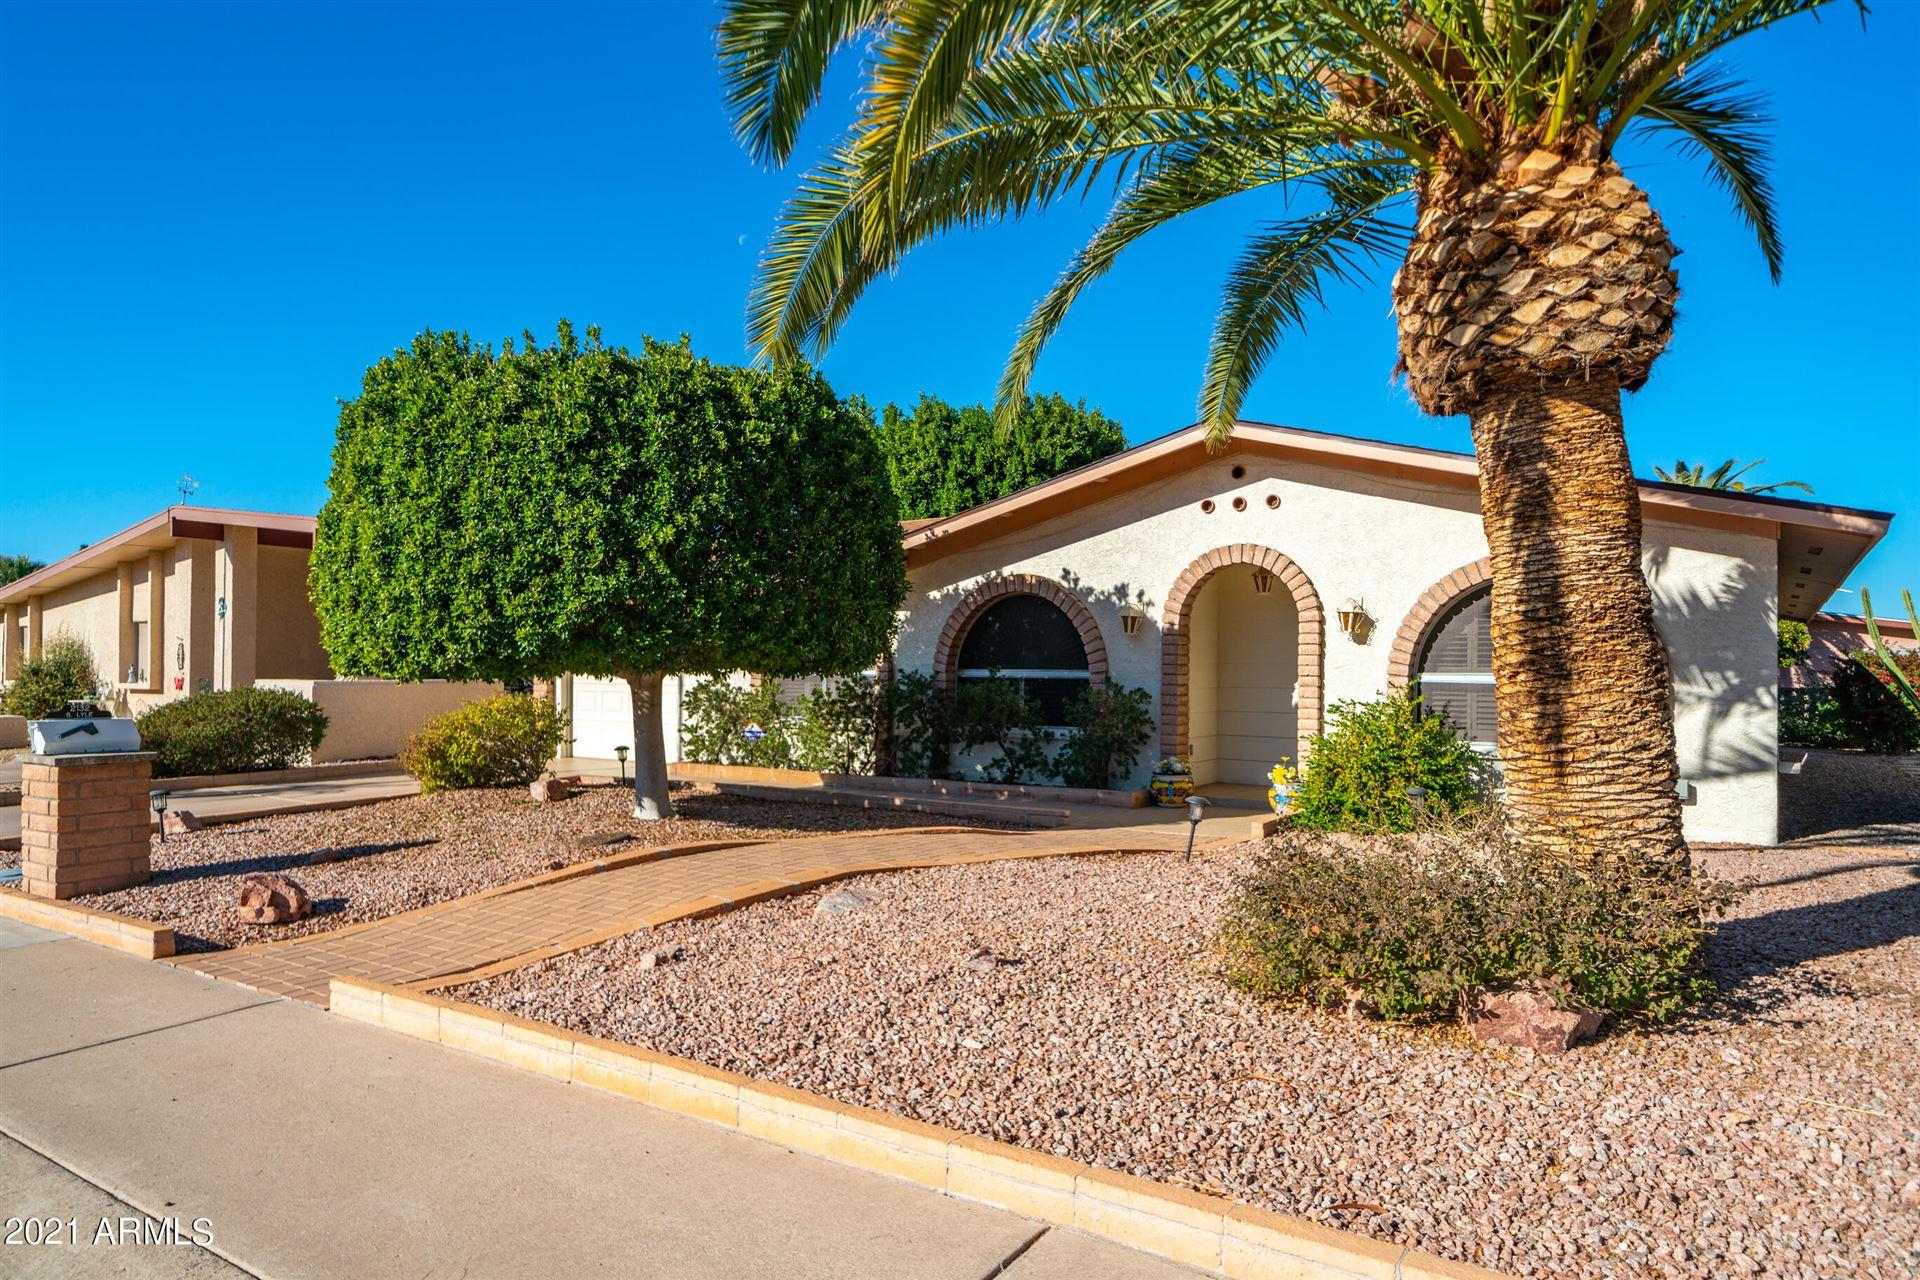 Photo of 2132 N STOCKTON Place, Mesa, AZ 85215 (MLS # 6199269)